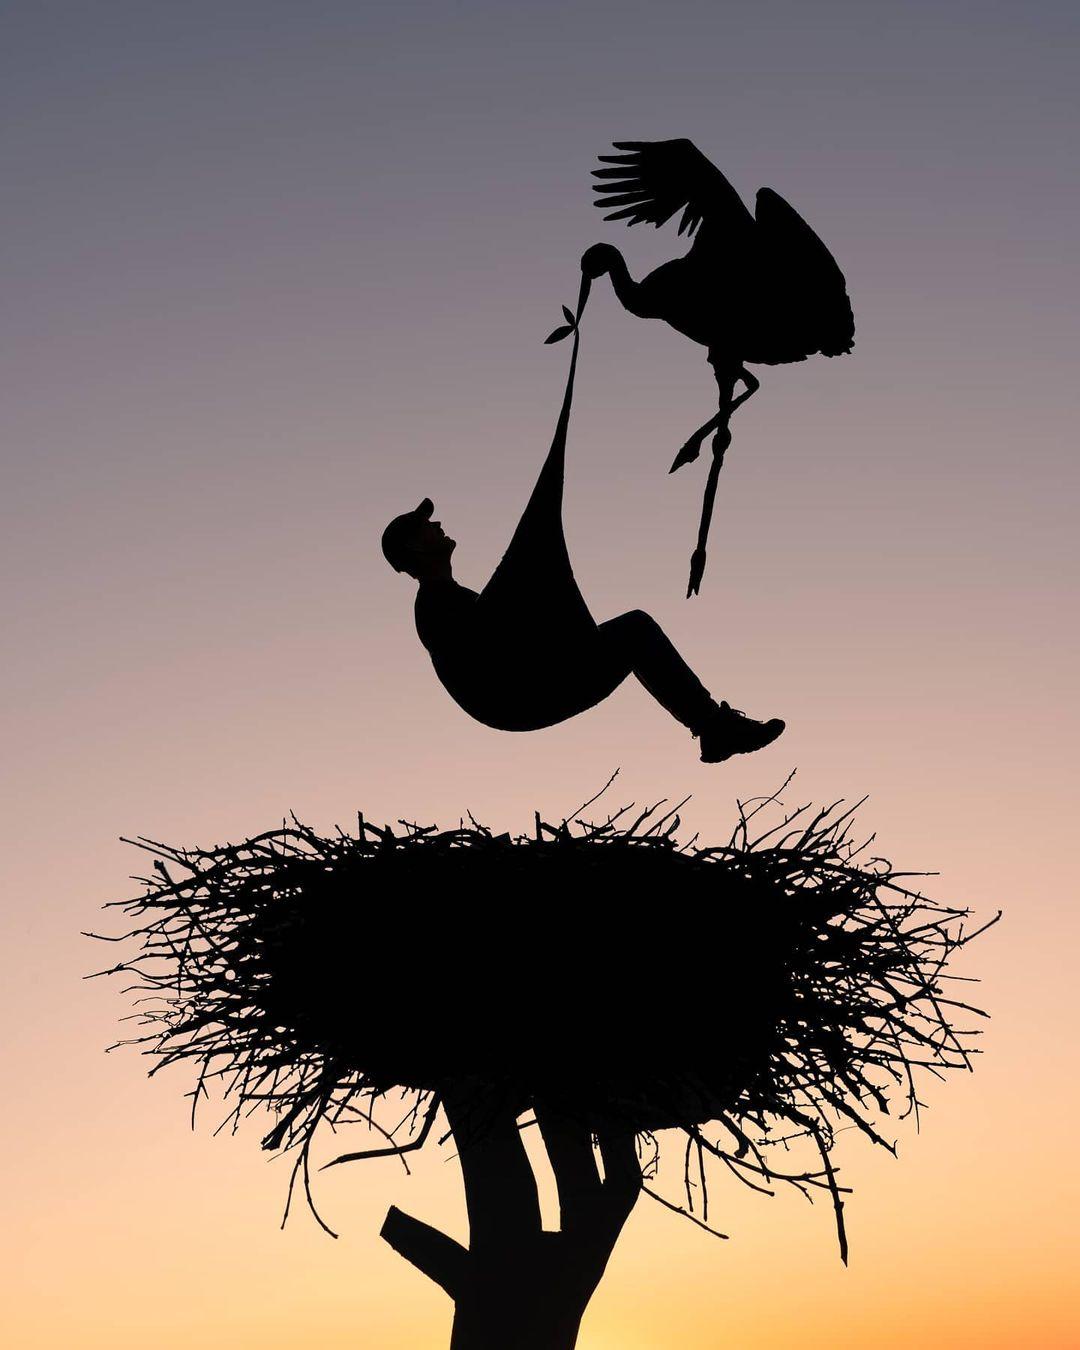 silhouette photography cardboard cutout bird nest by john marshall